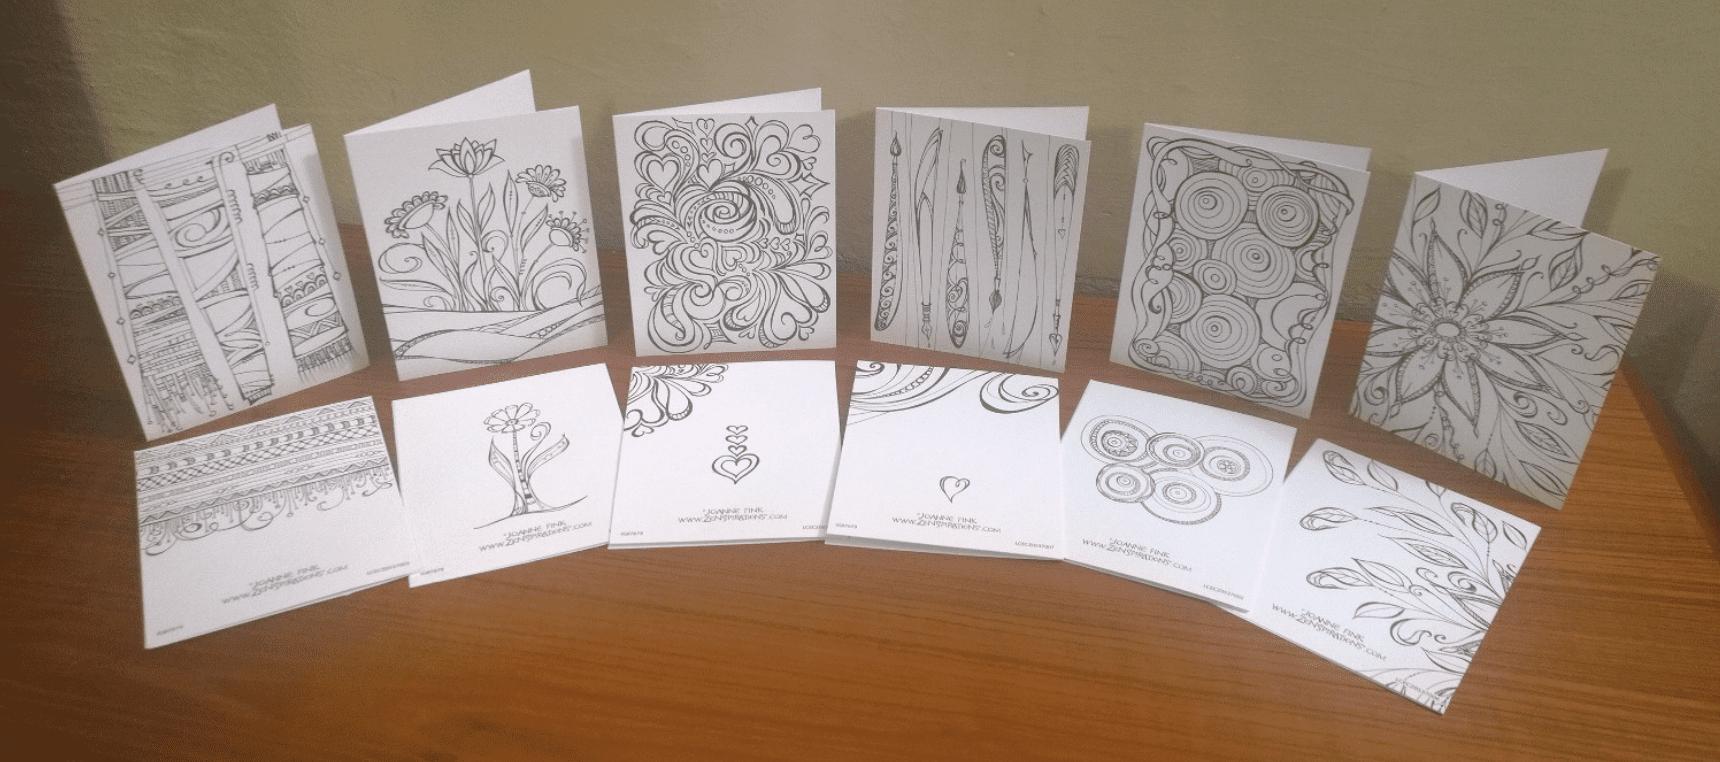 Zenspirations®_by_Joanne_Fink_Blog_1_16_16_Michaels_Bonanza_notecards_with_backs